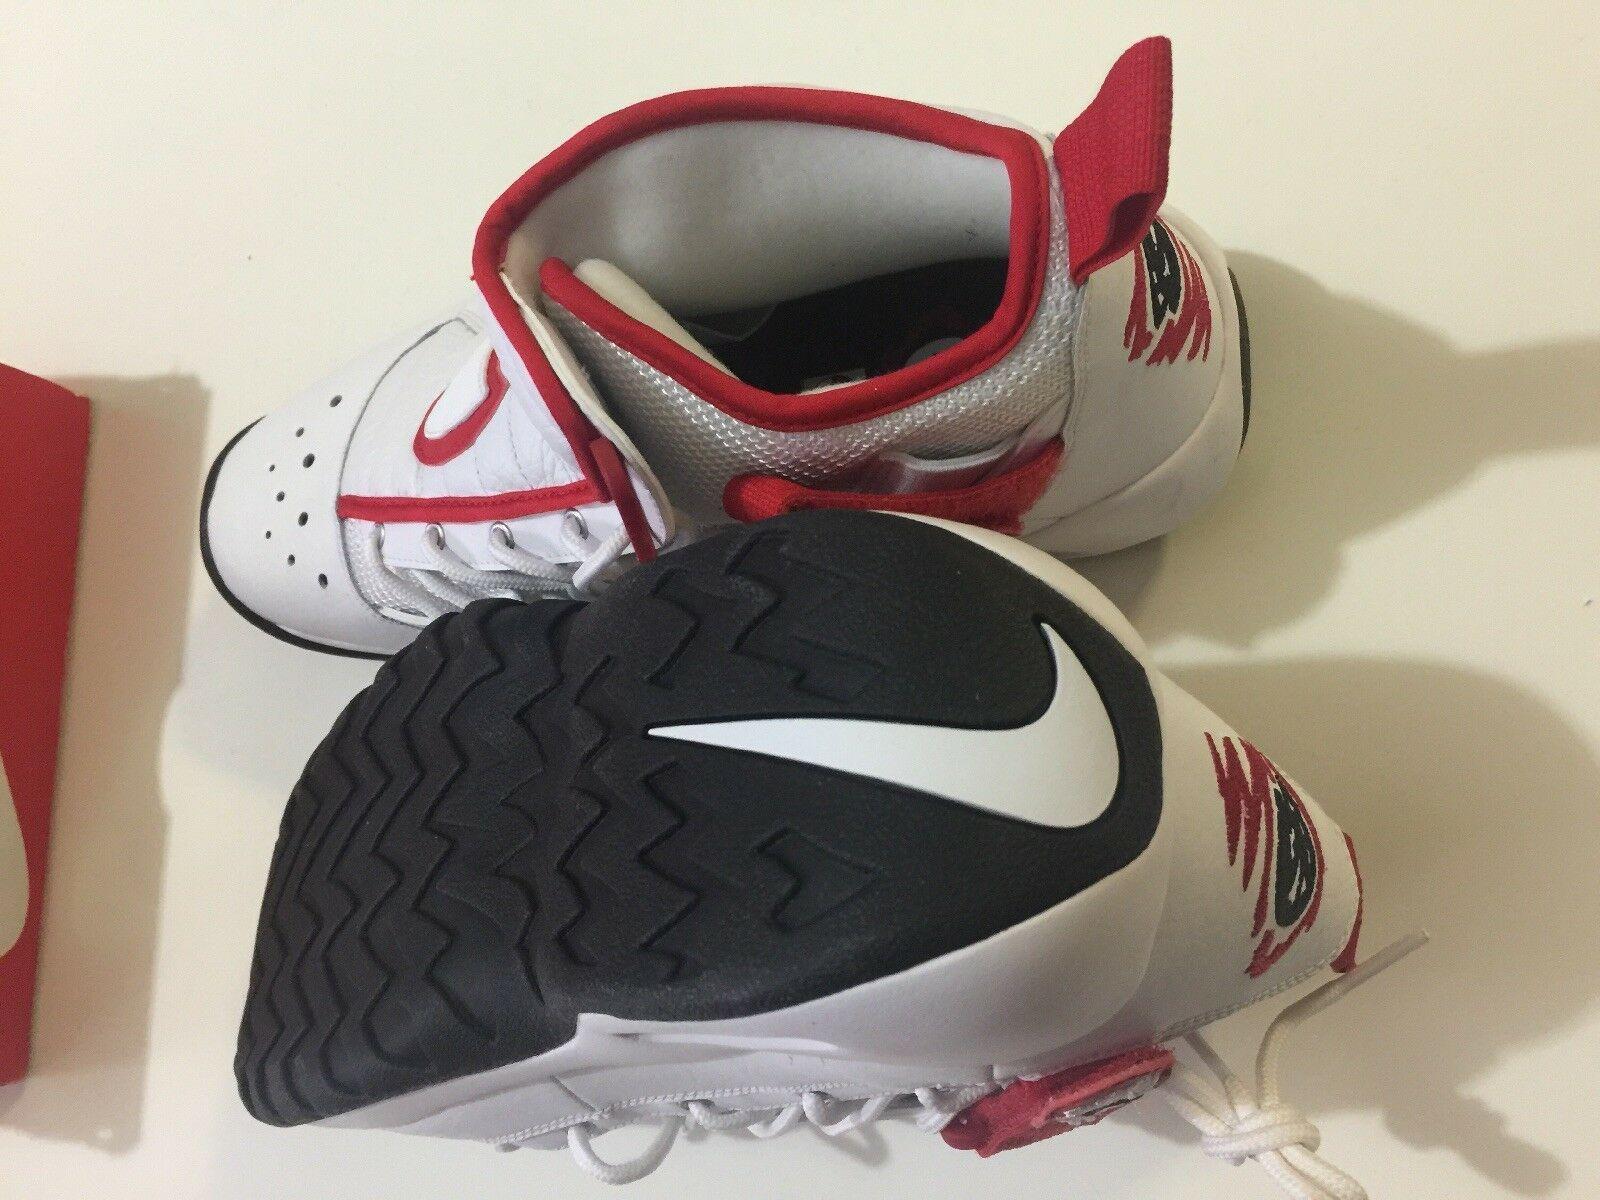 Nike Air Shake Ndestrukt Men's Basketball Shoes White/Red 880869 100 Size 11 image 10